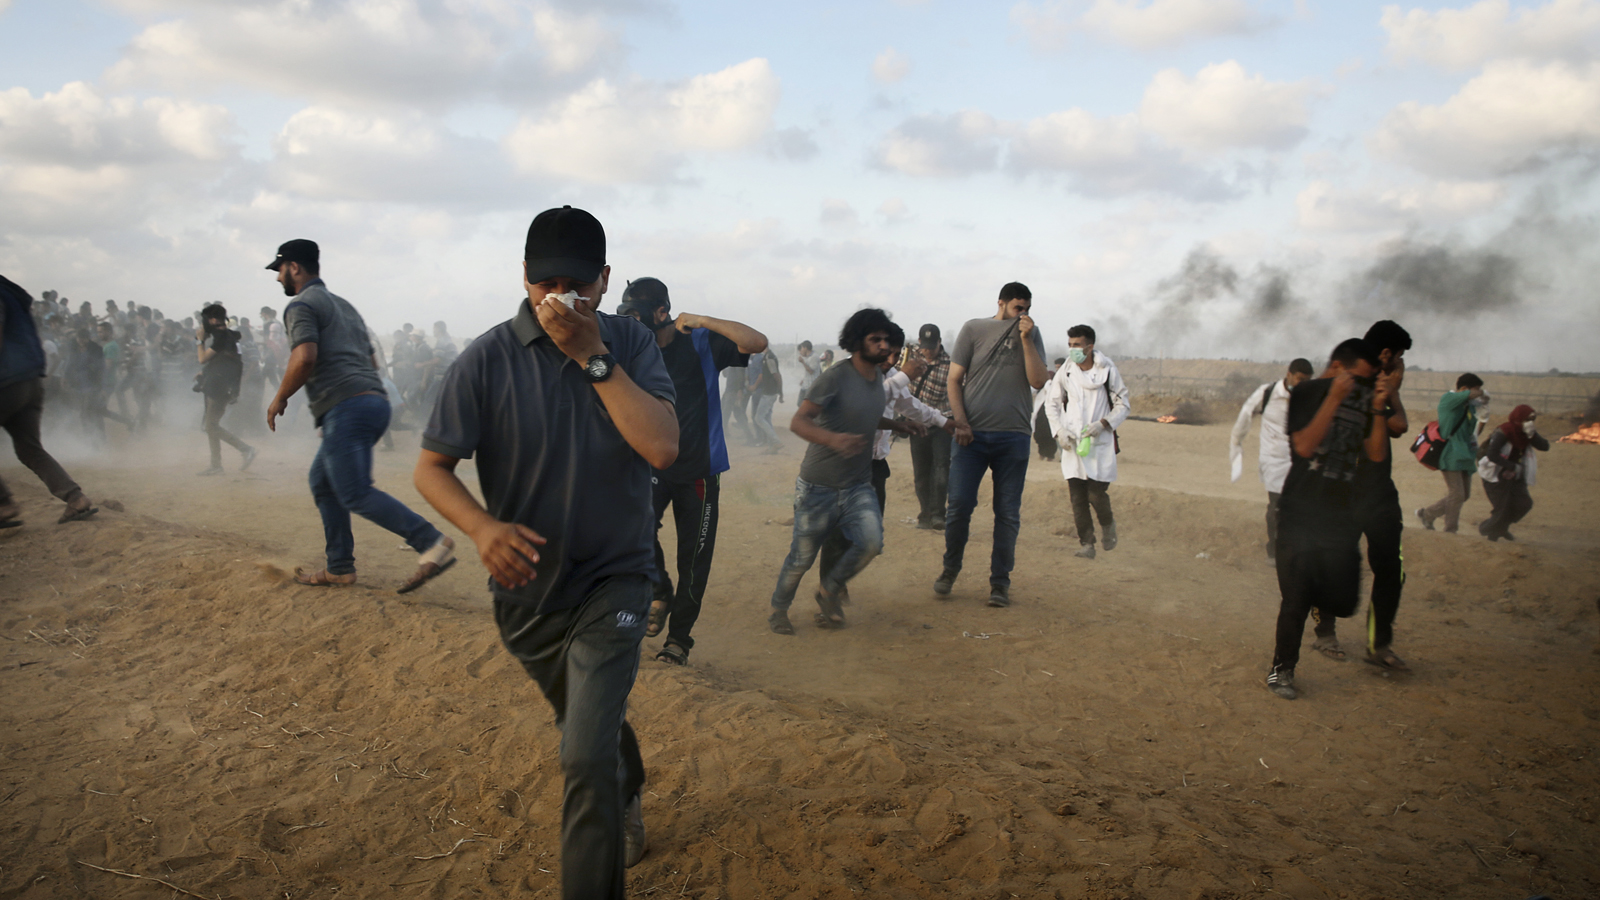 Bracklig vapenvila i gaza efter hamas ja